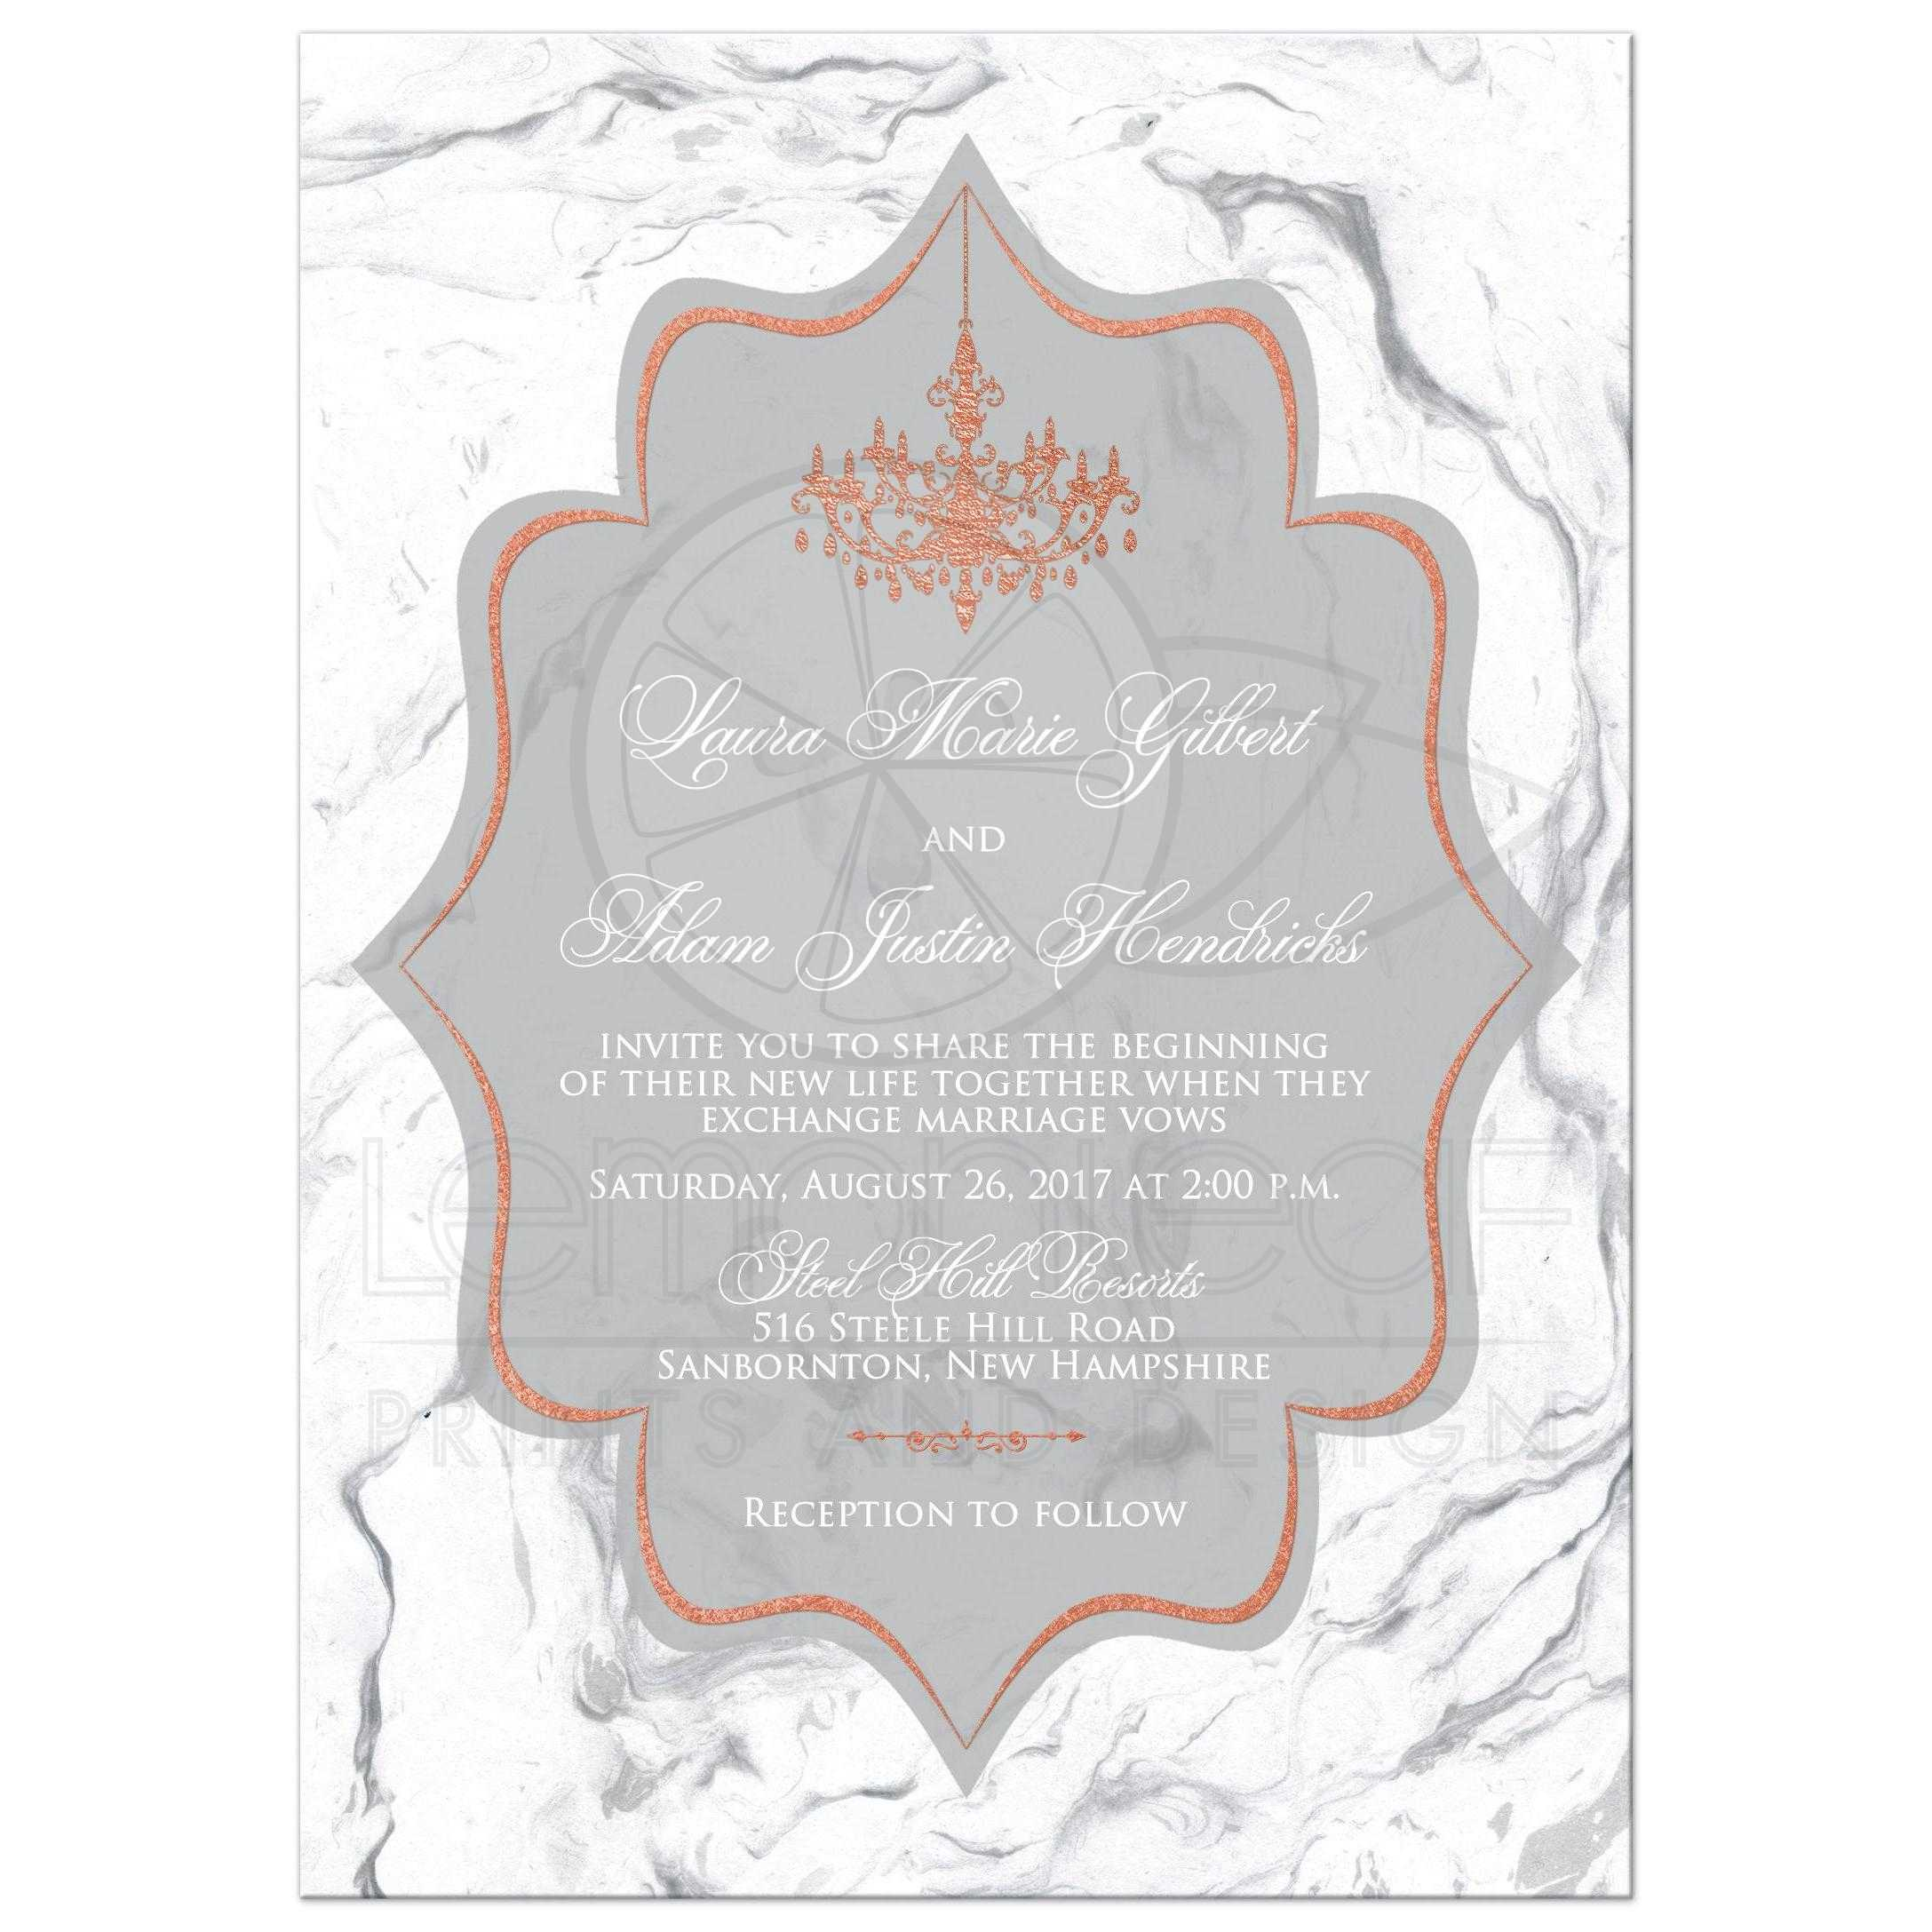 Foil Wedding Invitations.Faux Copper Foil Wedding Invitation Gray White Faux Marble Formal Chandelier